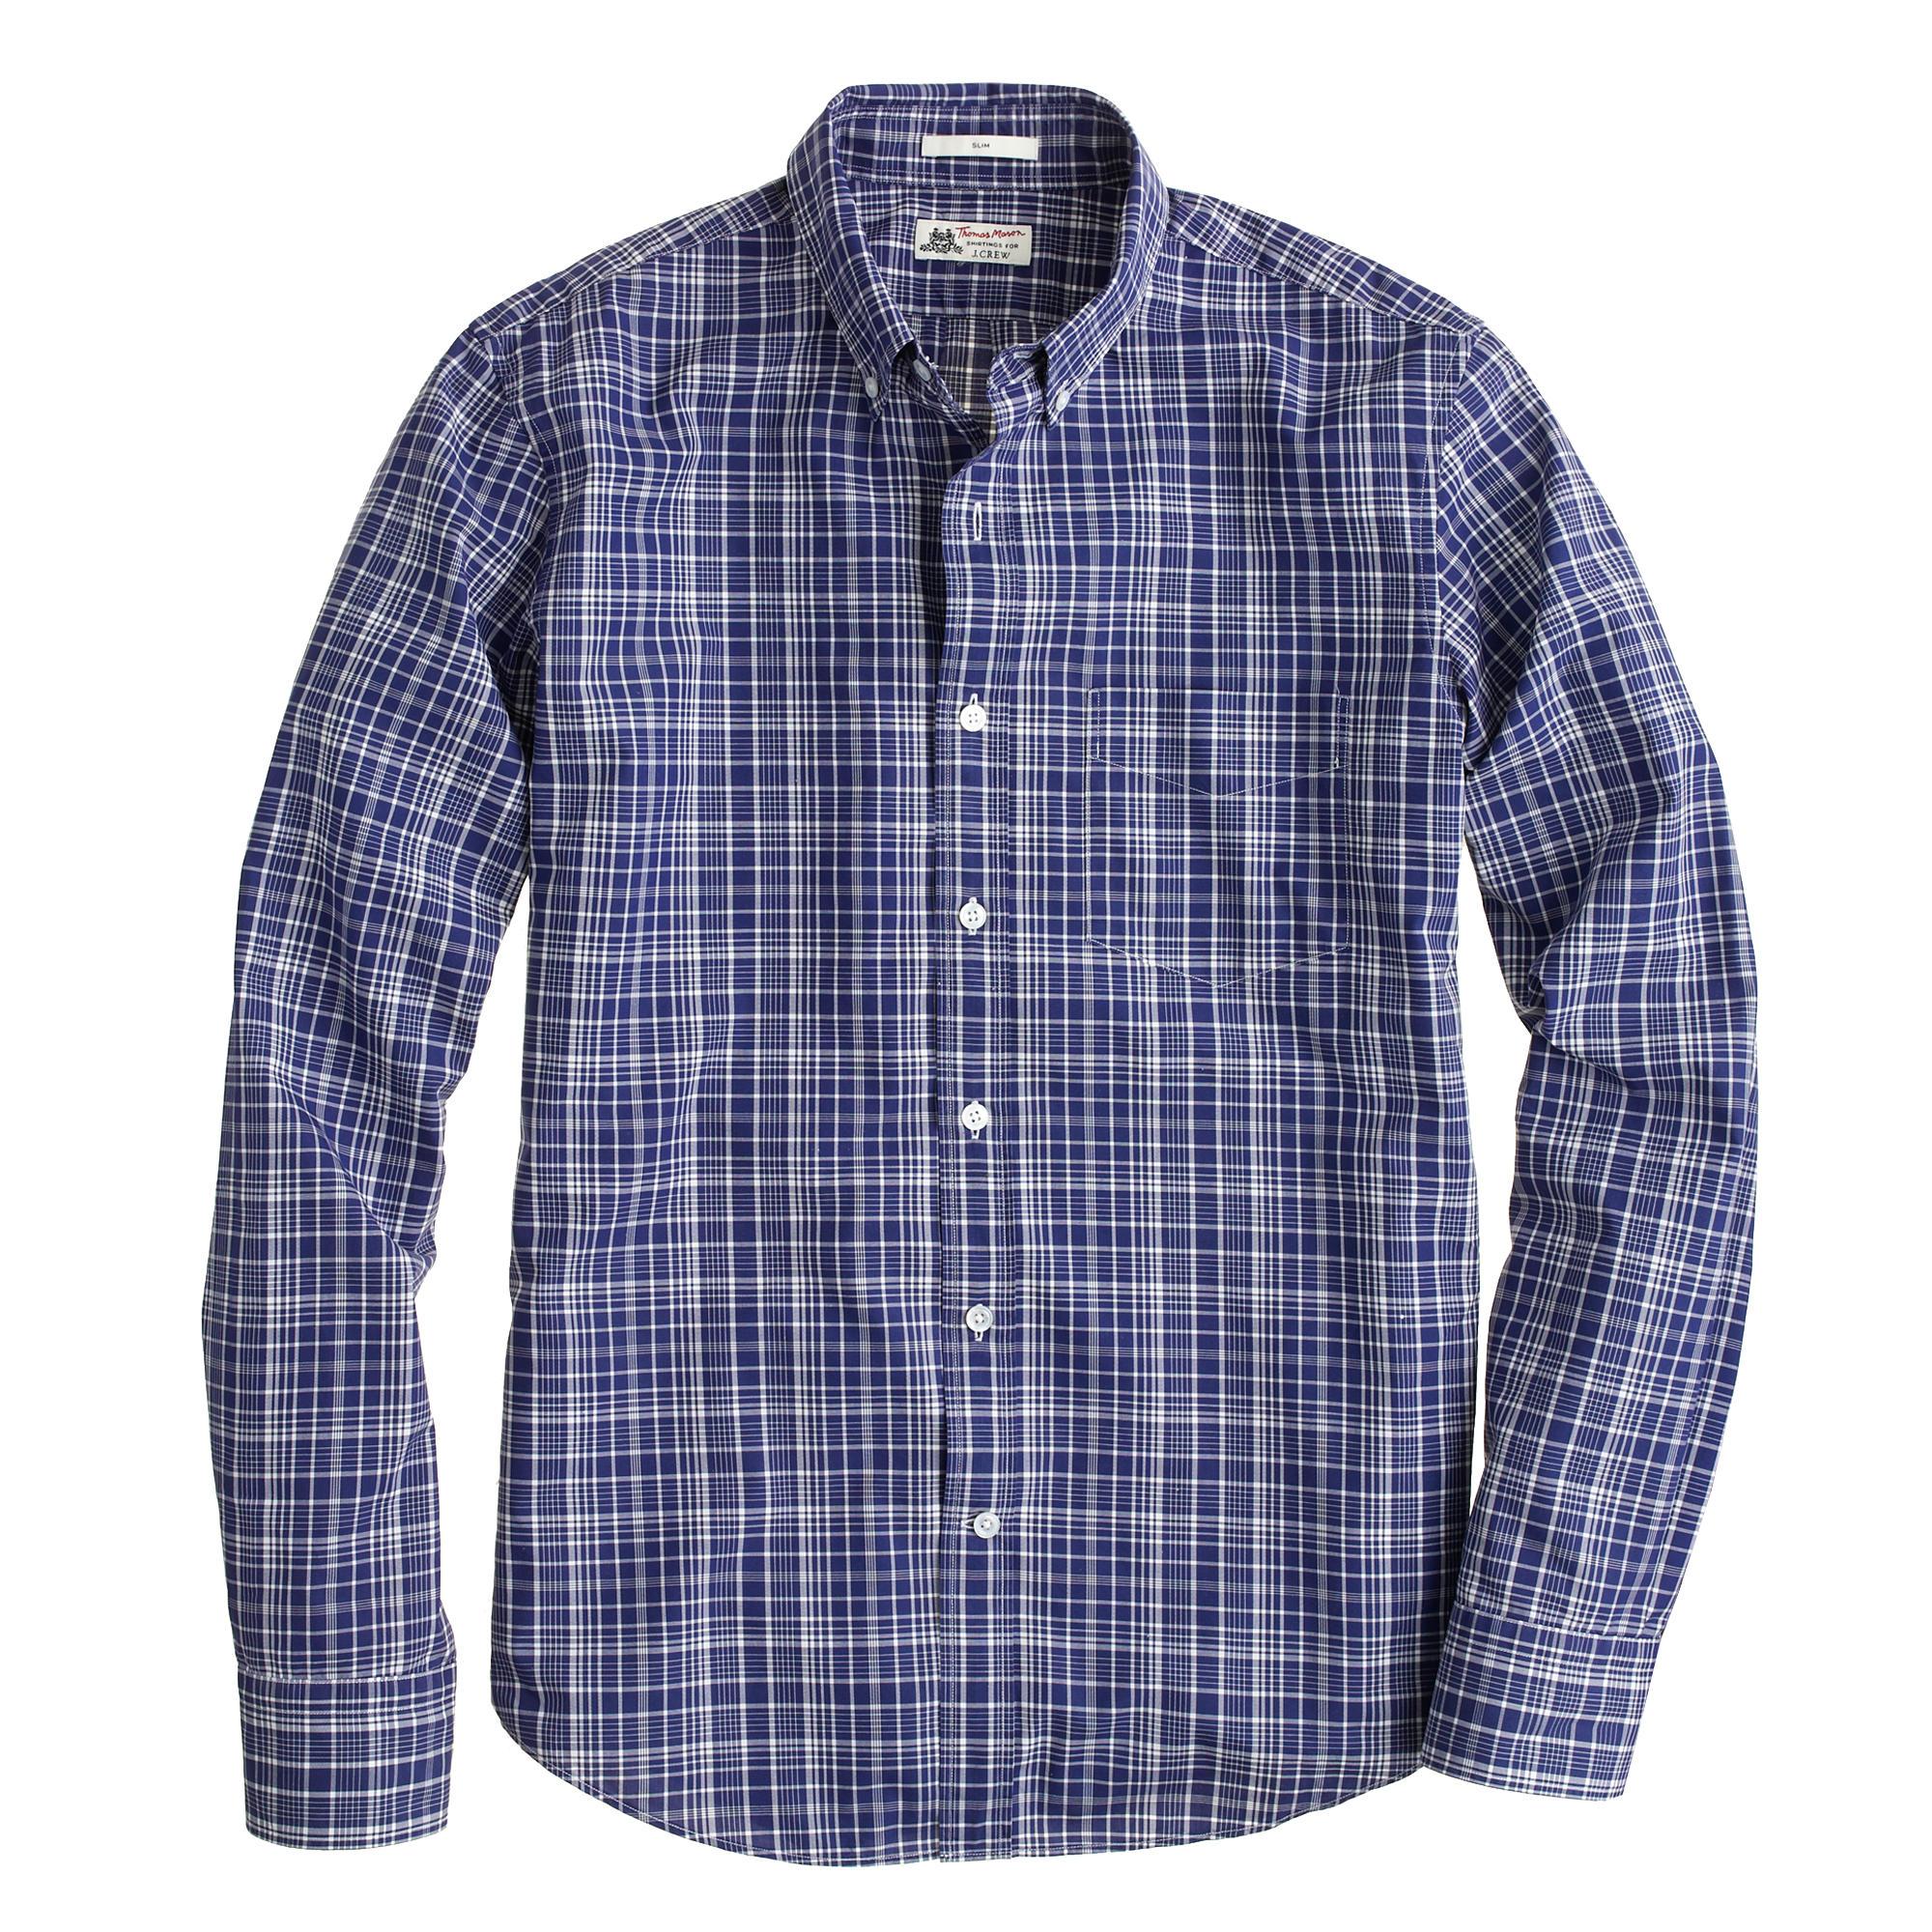 Slim thomas mason archive for j crew shirt in 1912 tartan for Thomas mason dress shirts